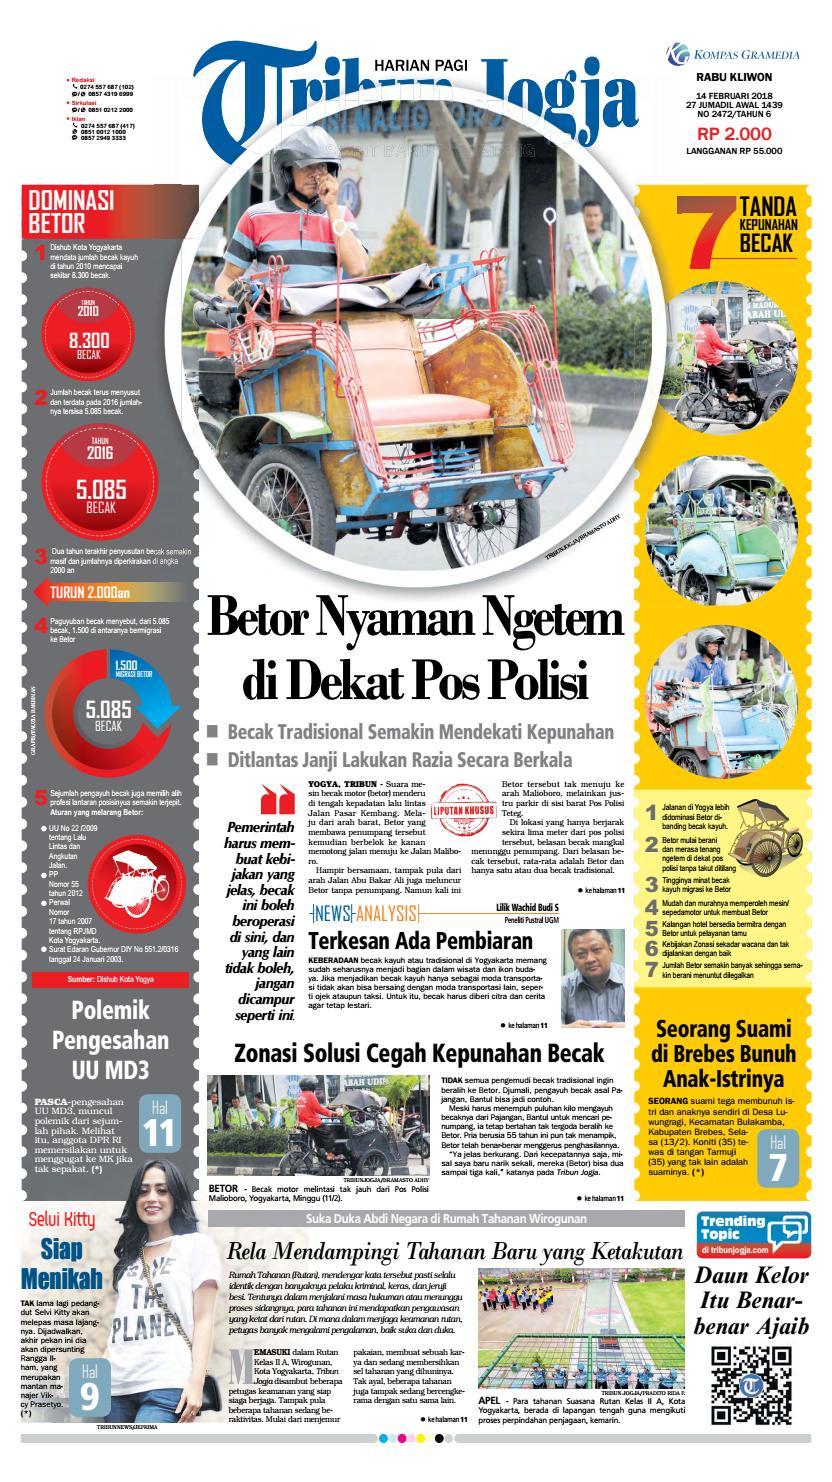 Tribunjogja 14 02 2018 By Tribun Jogja Issuu Produk Ukm Bumn Bahan Songket Sulam Katun Merah